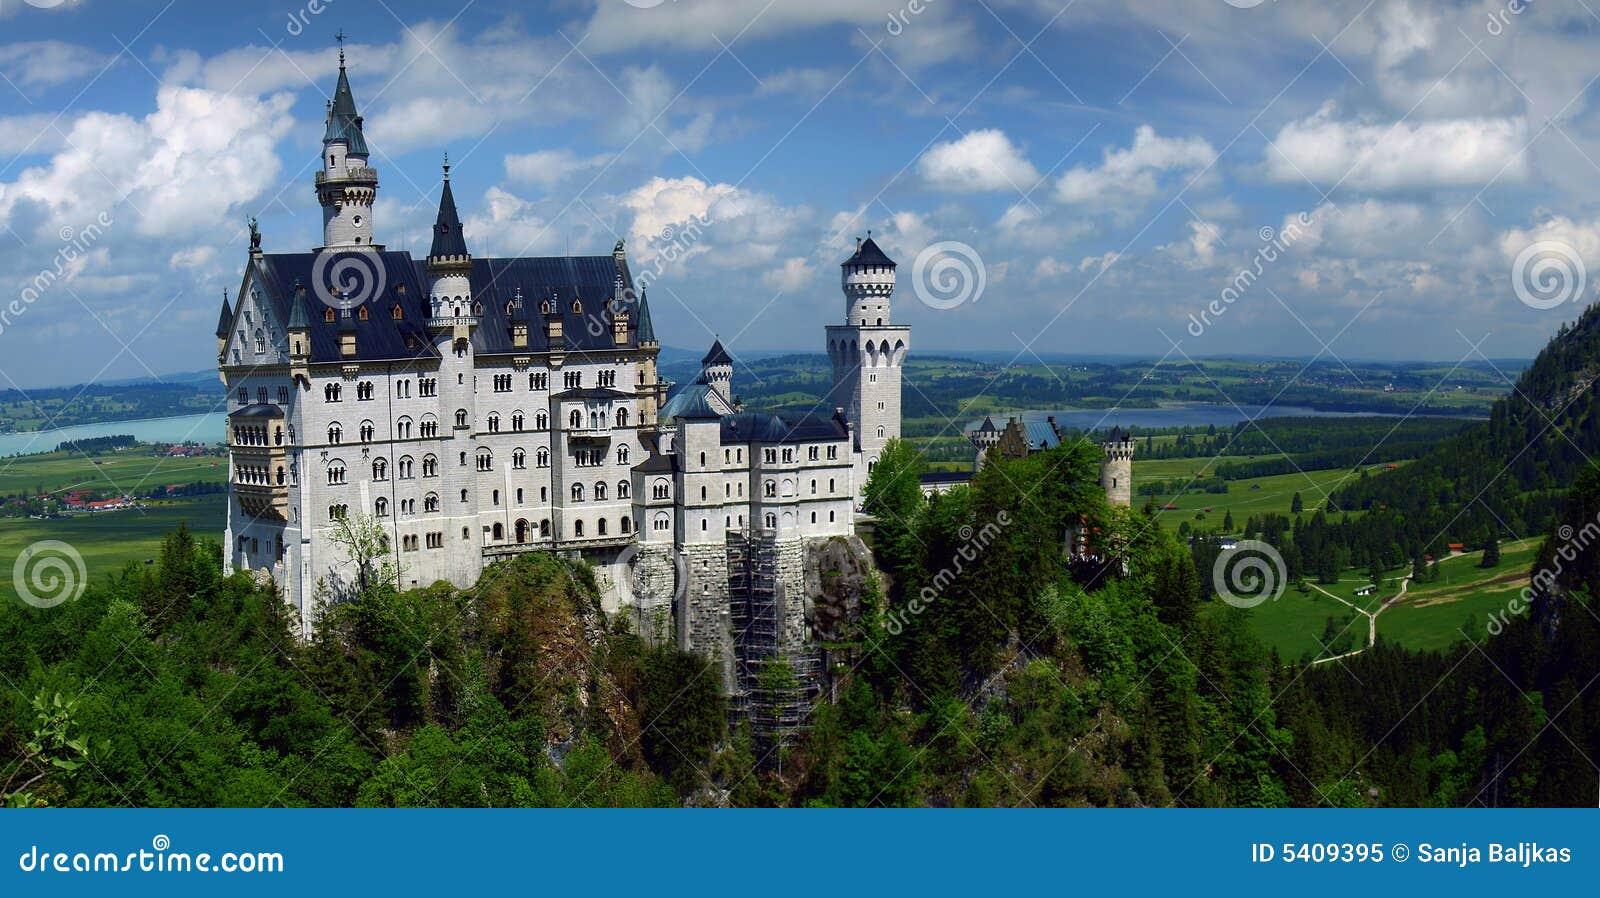 Bayerisches Schloss - Neuschwanstein Schloss